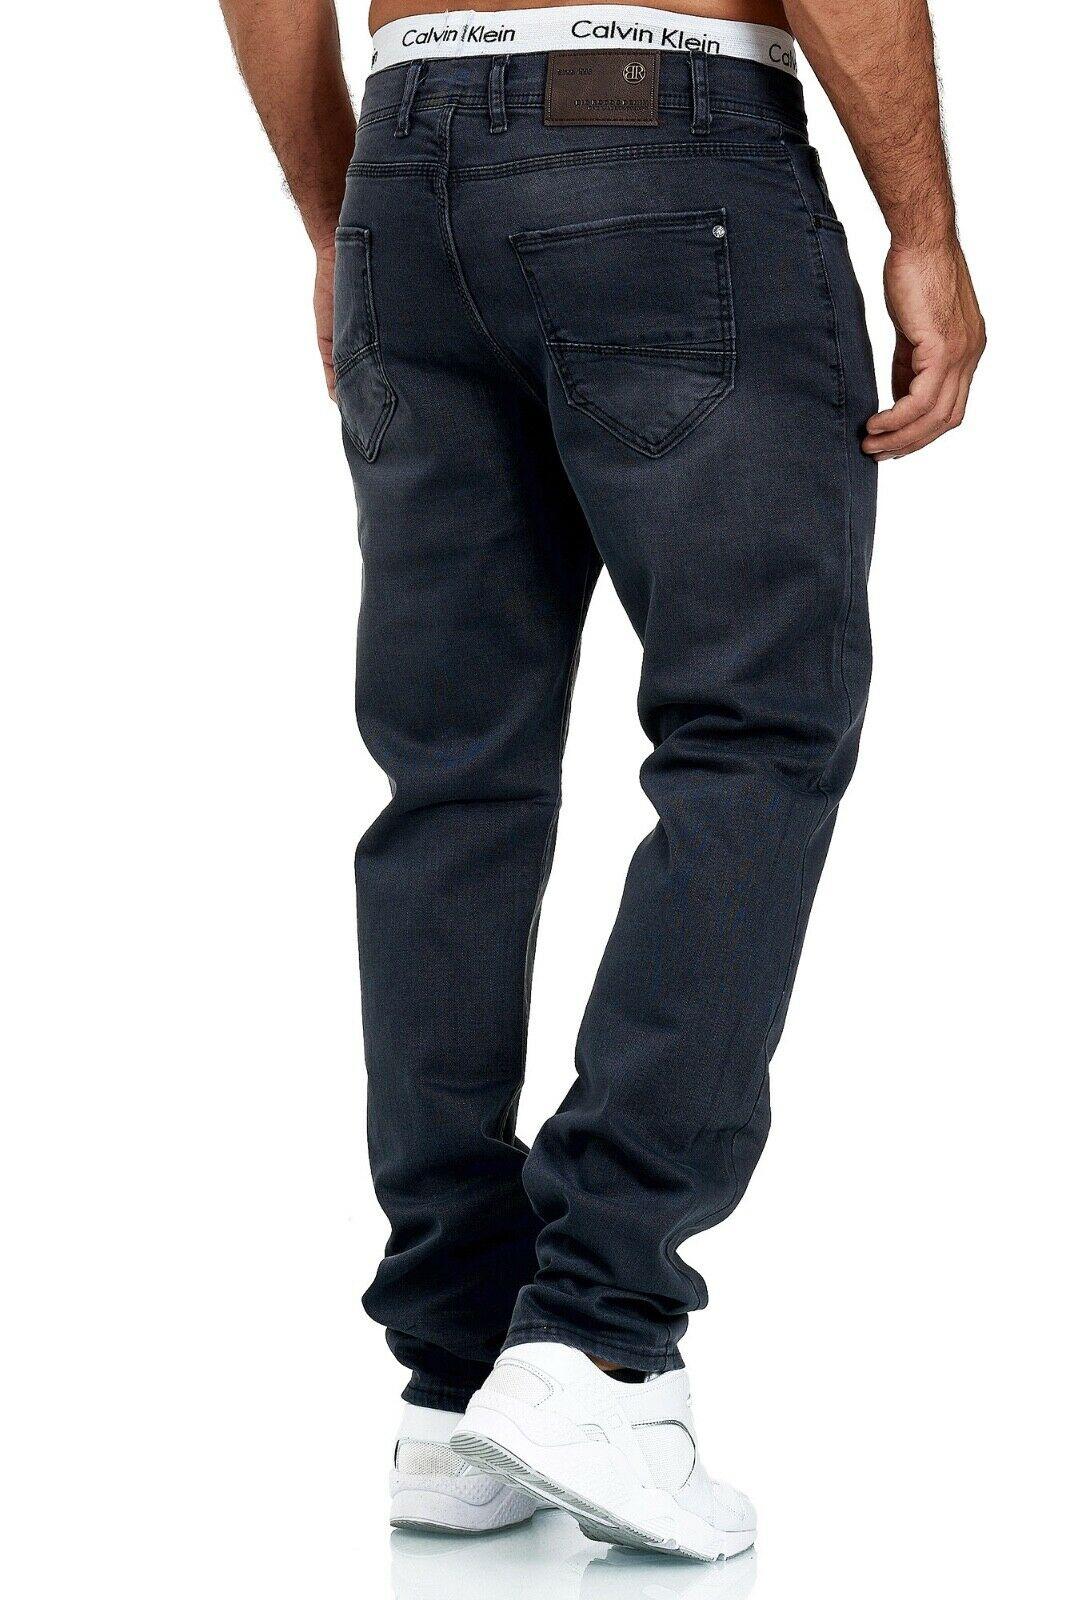 Herren-Jeans-Hose-Denim-KC-Black-Washed-Straight-Cut-Regular-Dicke-Naht-naehte Indexbild 84